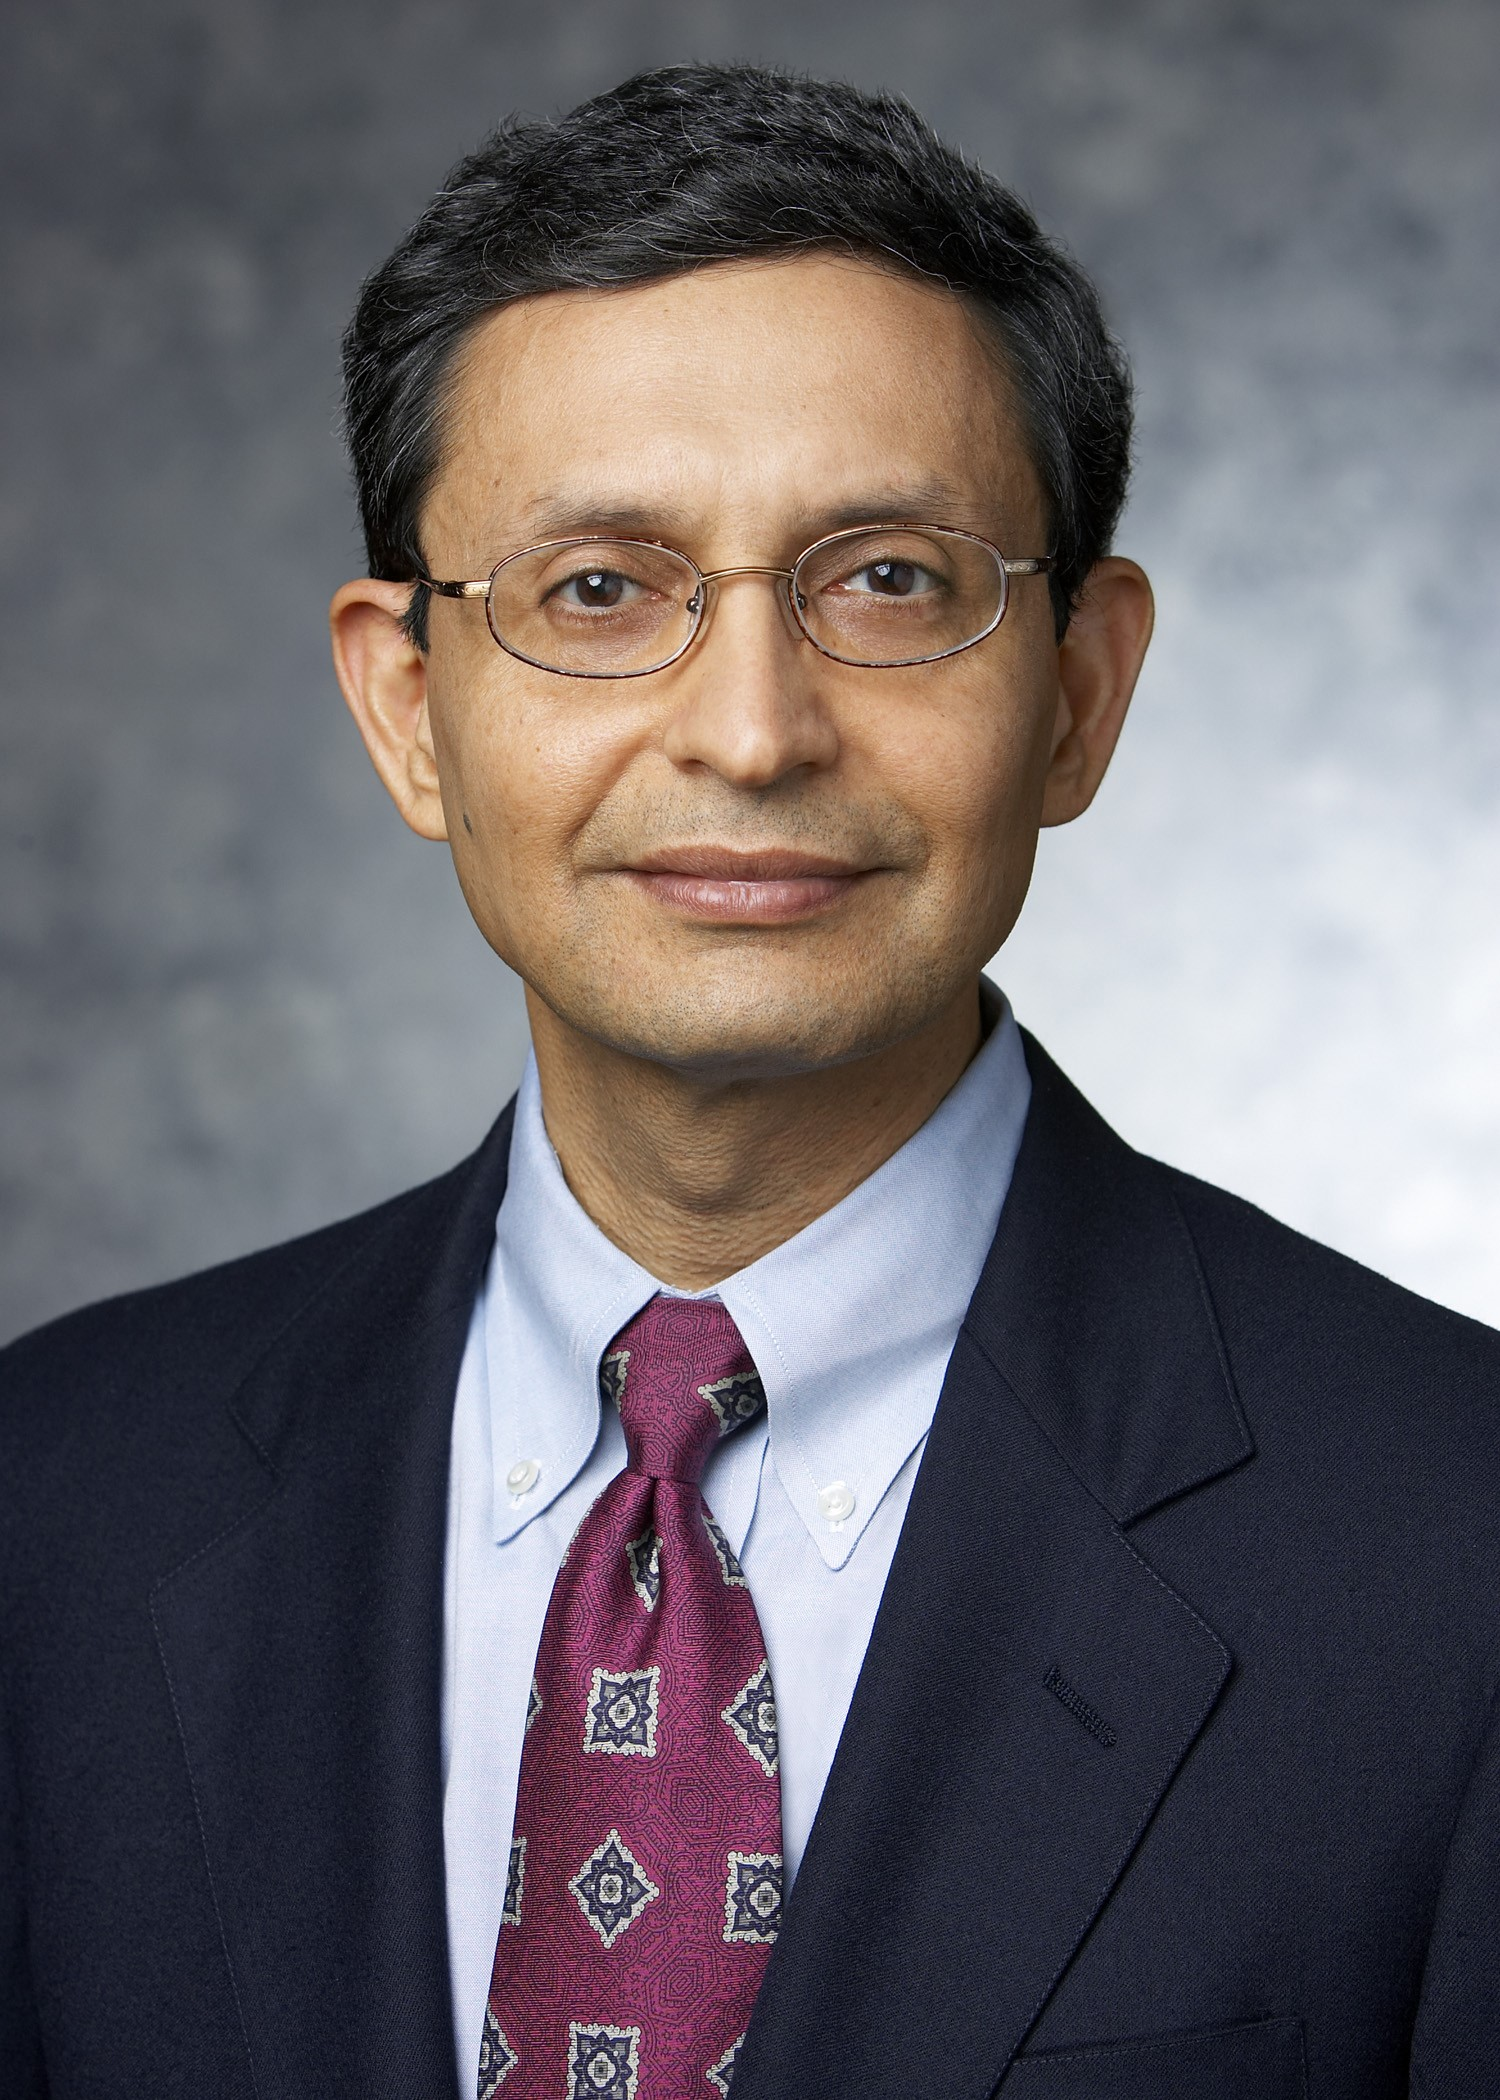 Raj Rawal